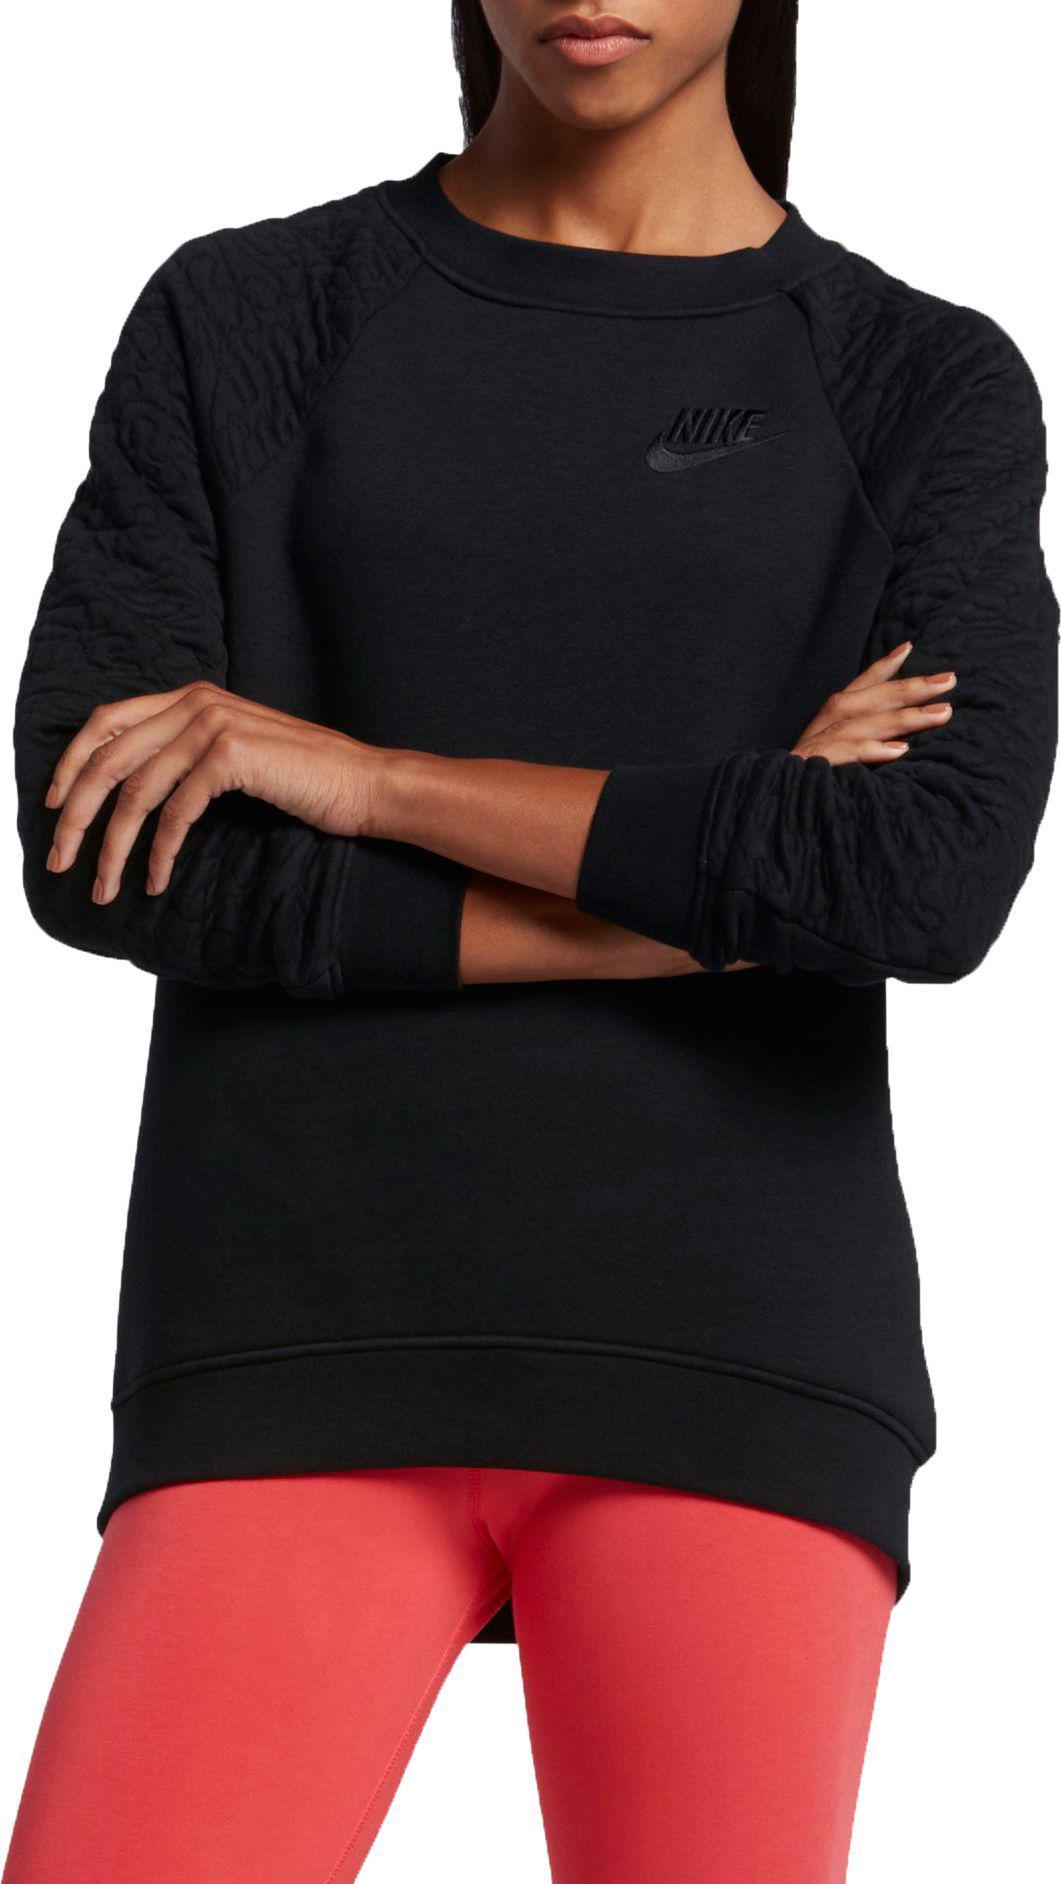 Nike Quilted Sportswear Rally Fleece Crewneck Sweatshirt In Black Lyst [ 1884 x 1061 Pixel ]